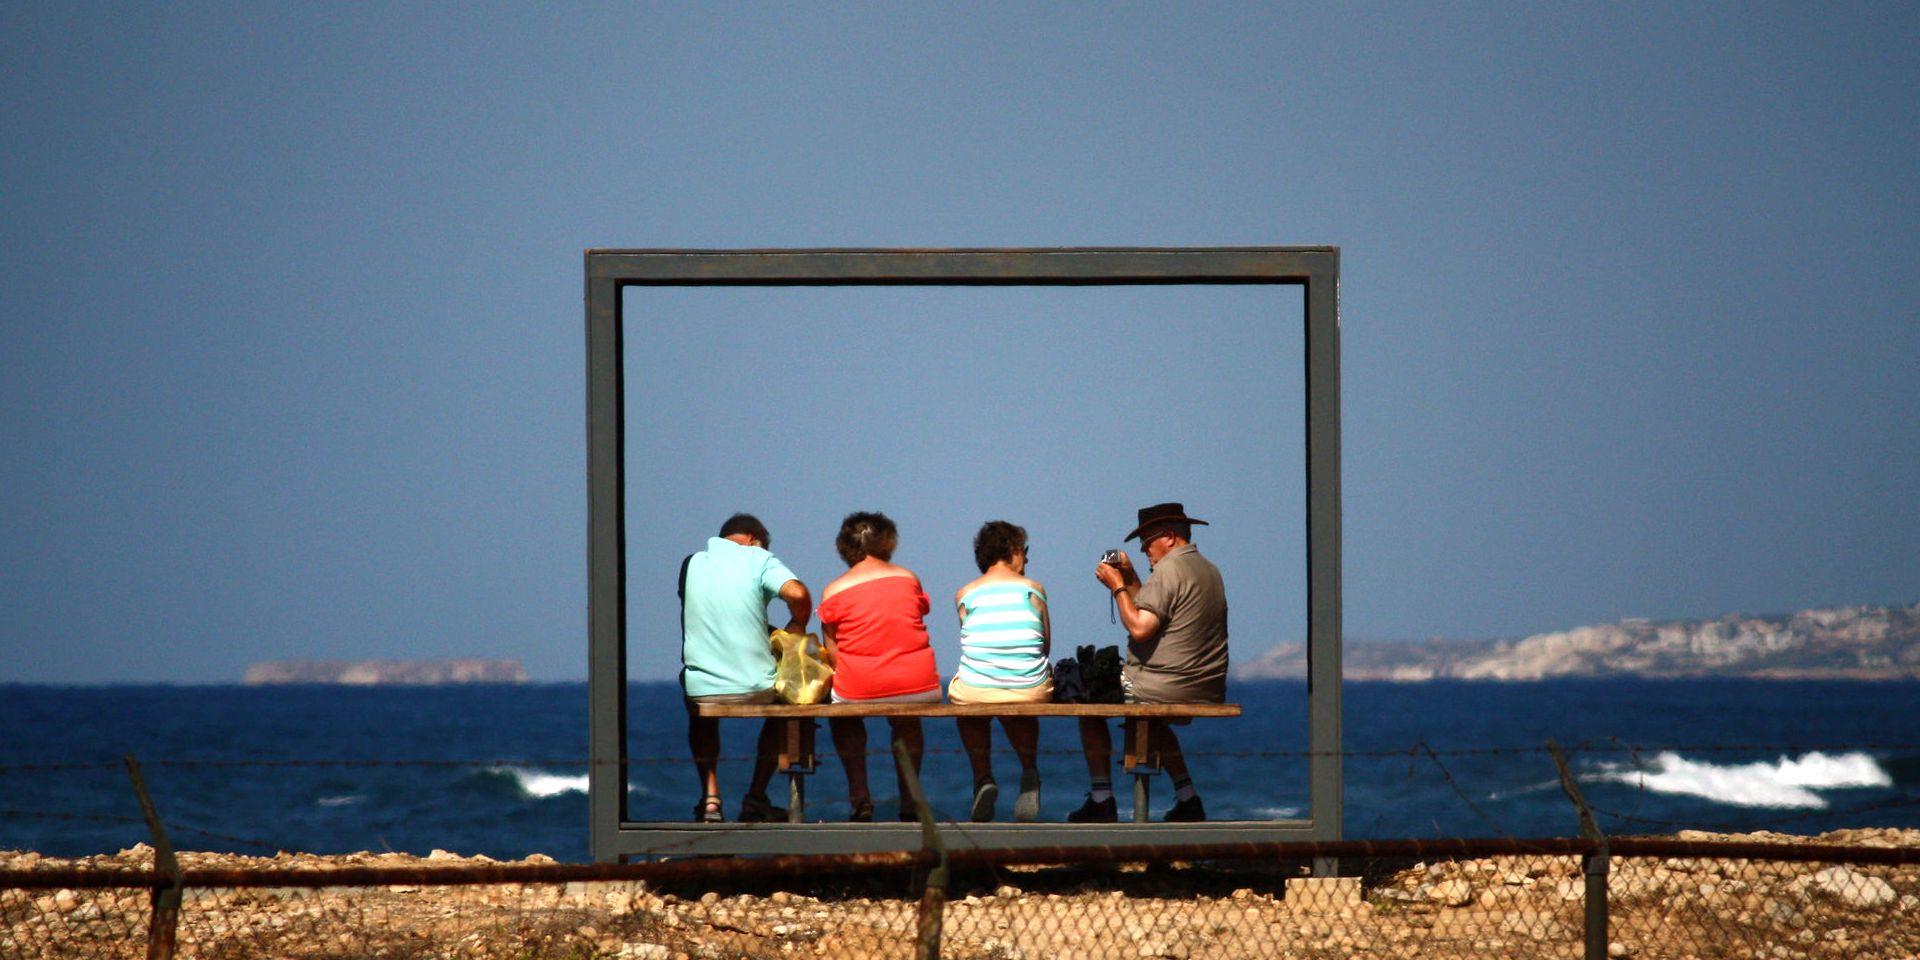 Photo Frame - fotografia di Jon Culver (BY NC 2.0)